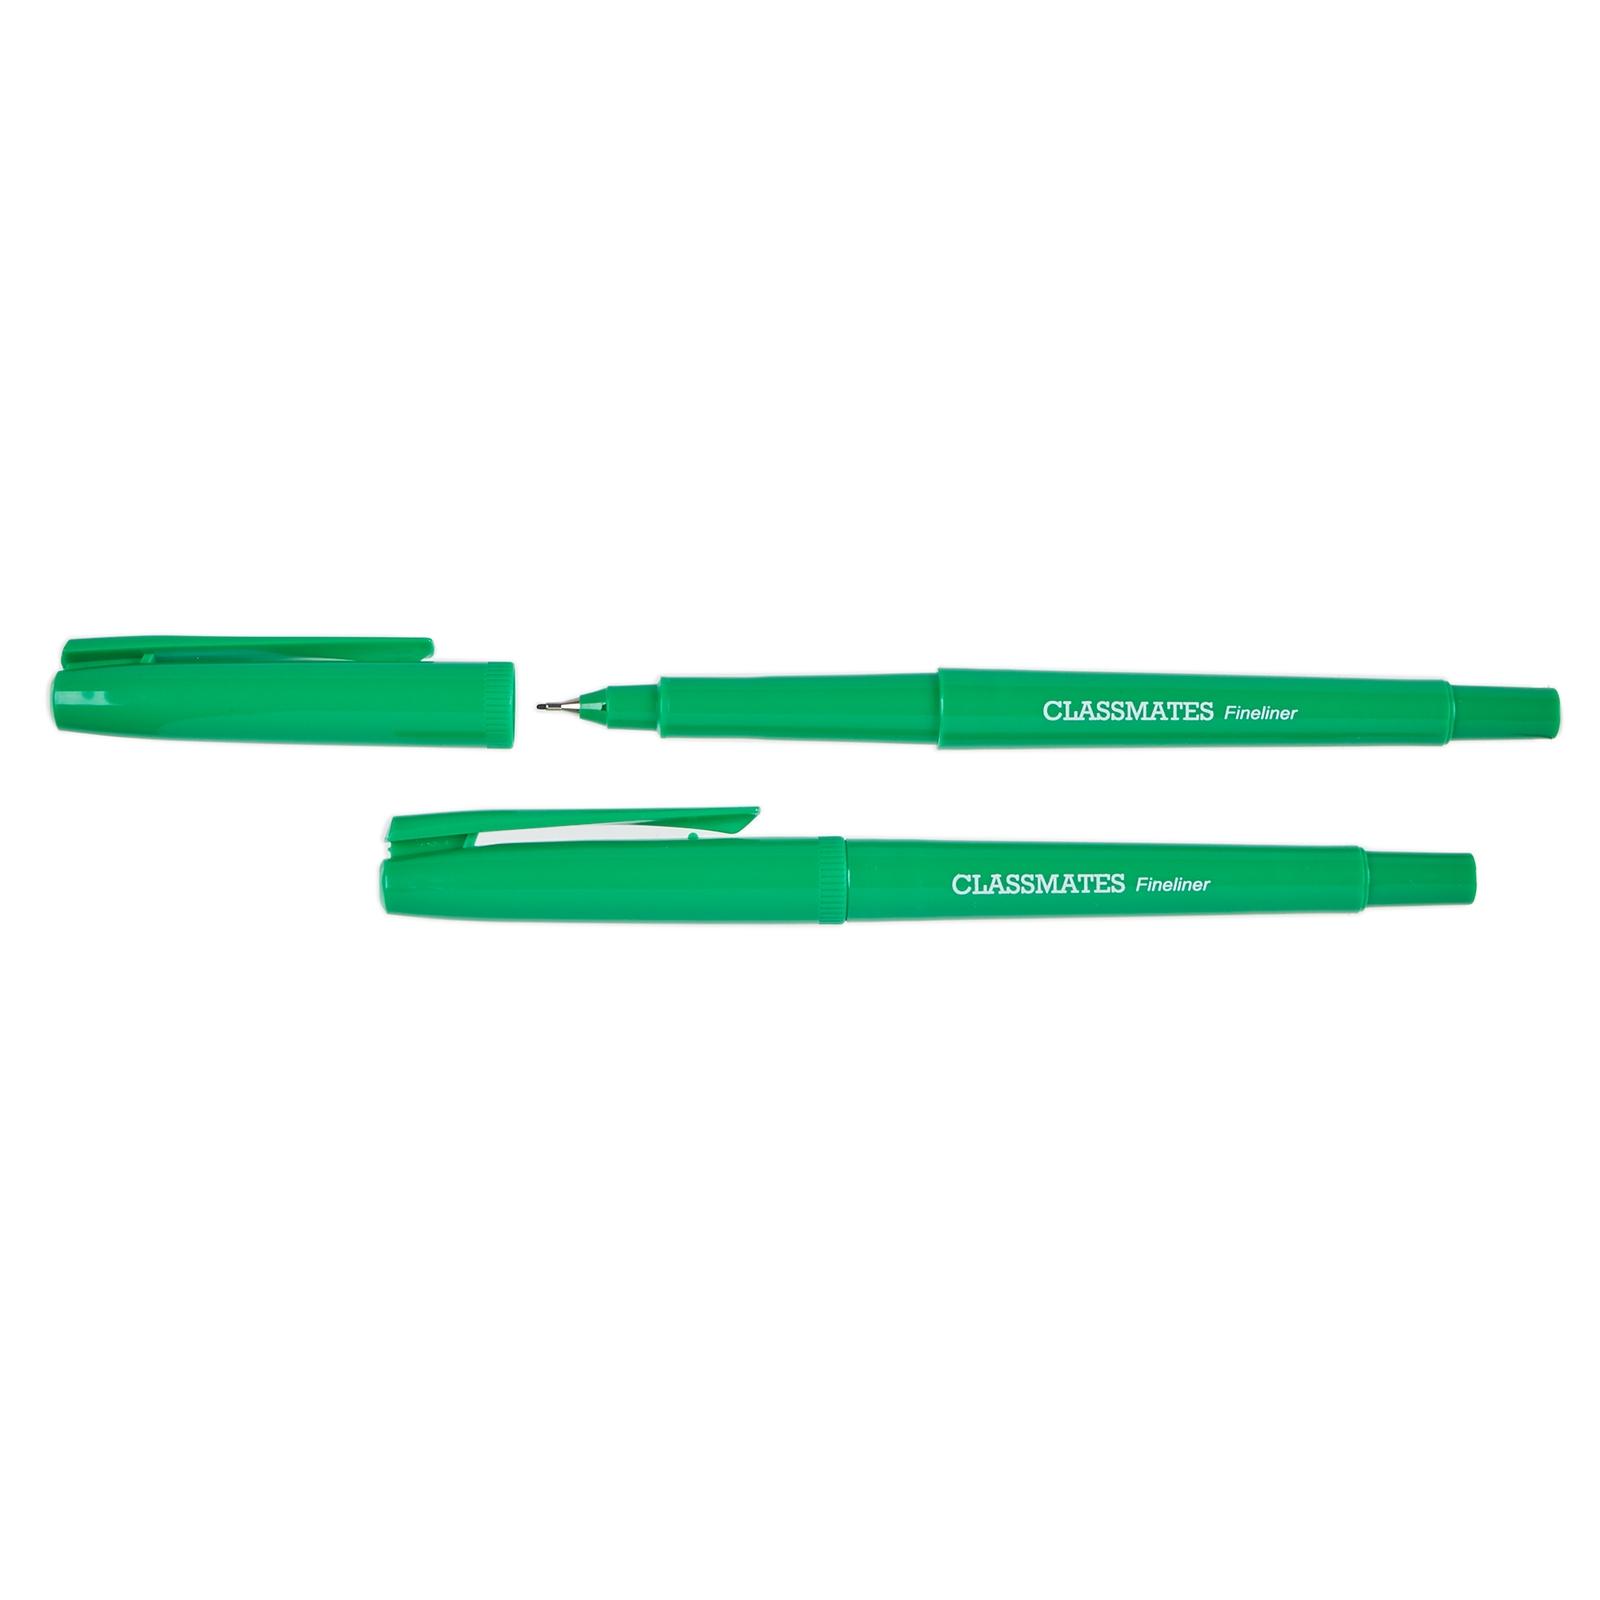 Classmates Fineliner Pen Green - Pack of 10